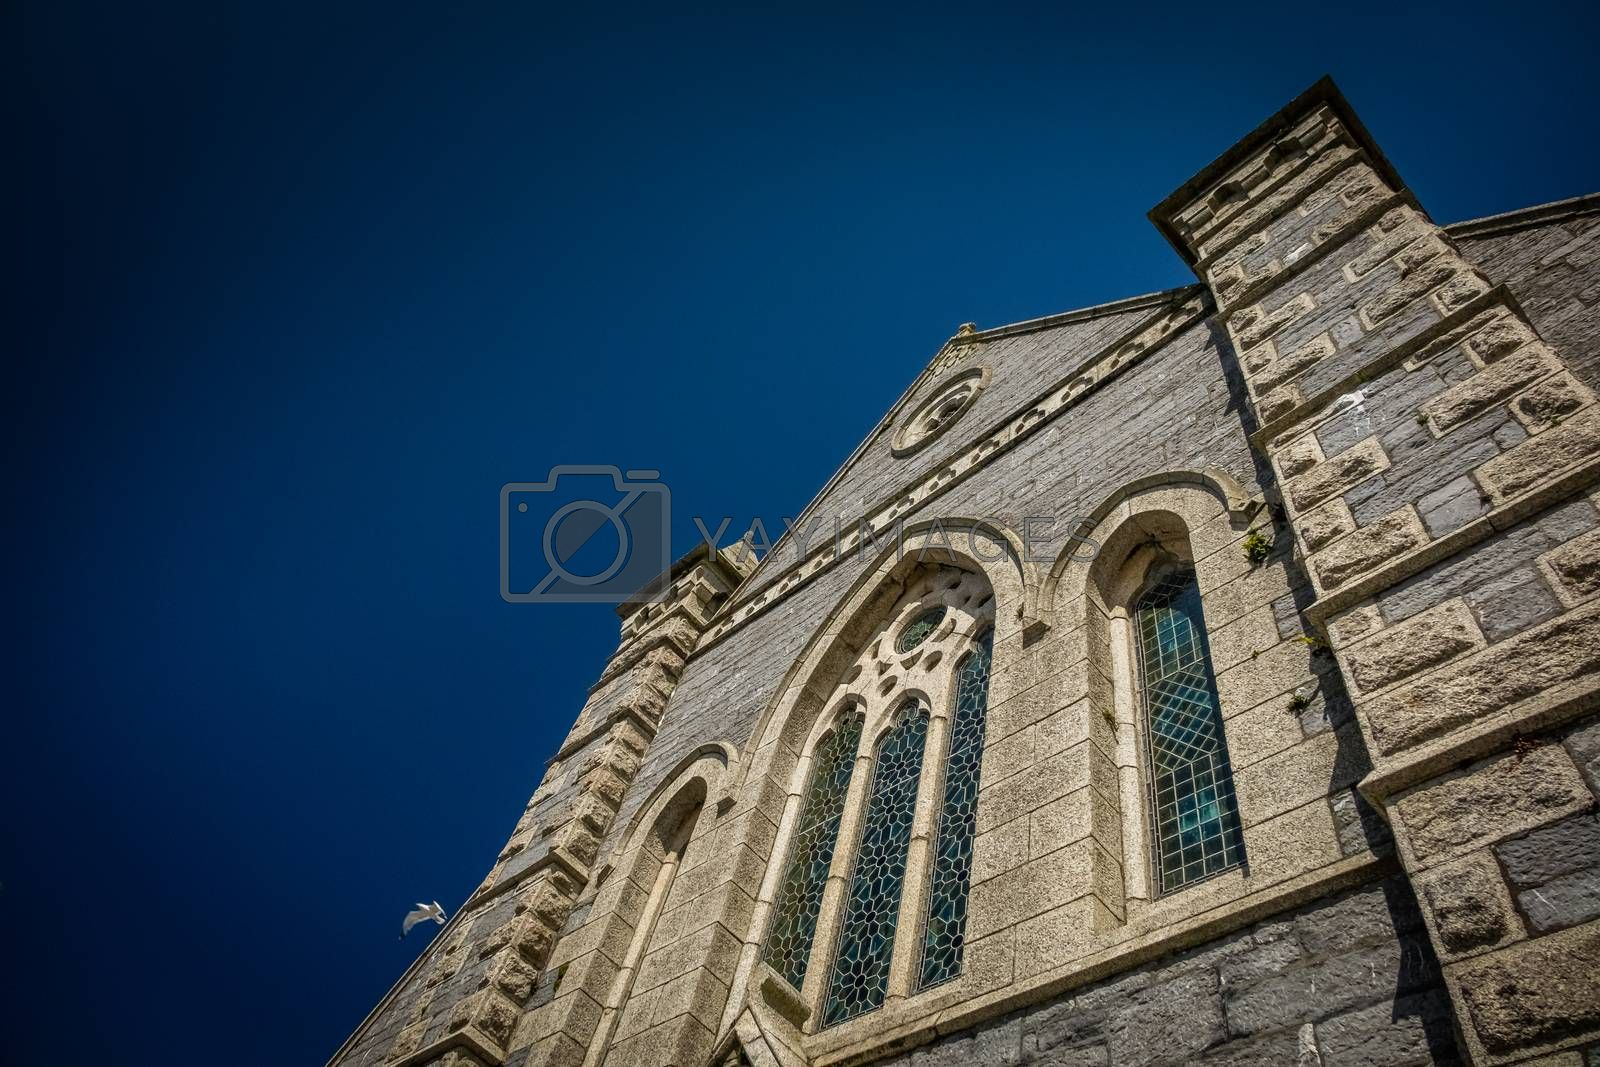 Newquay Methodist Church in Newquay, Cornwall, UK